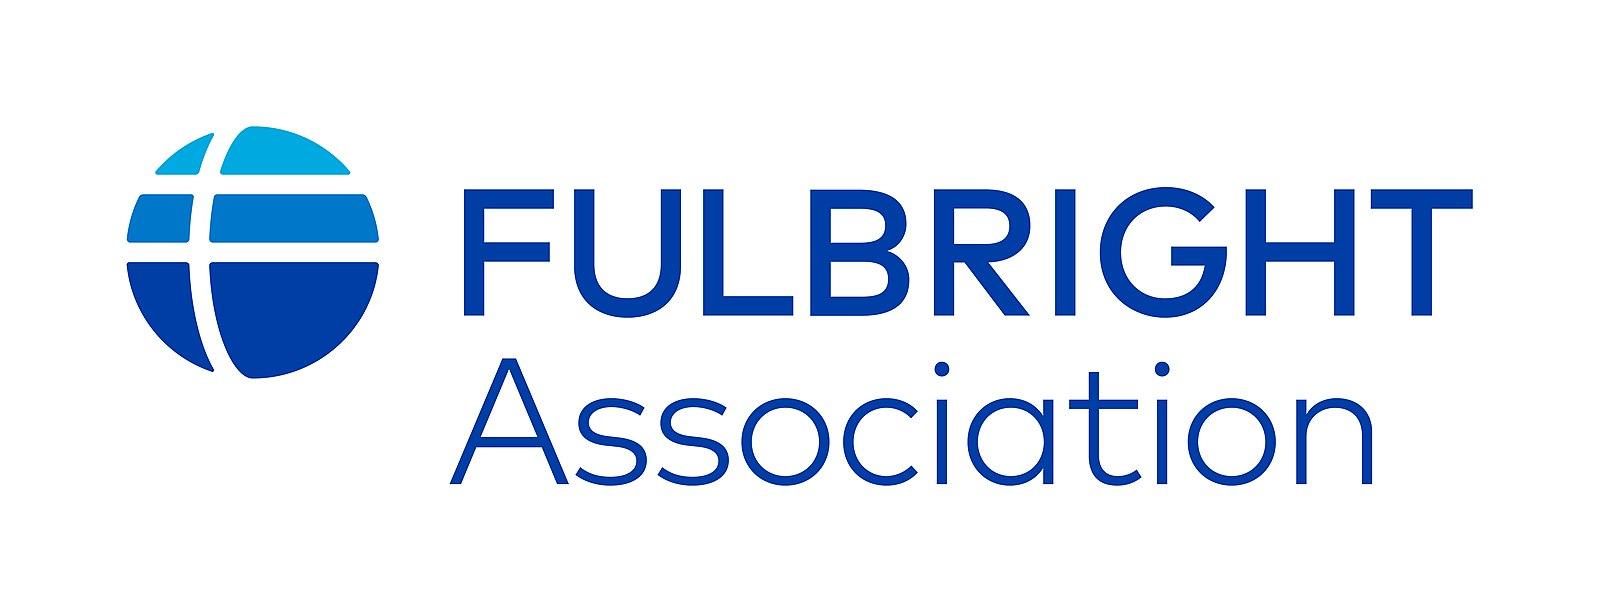 Official Fulbright Association logo